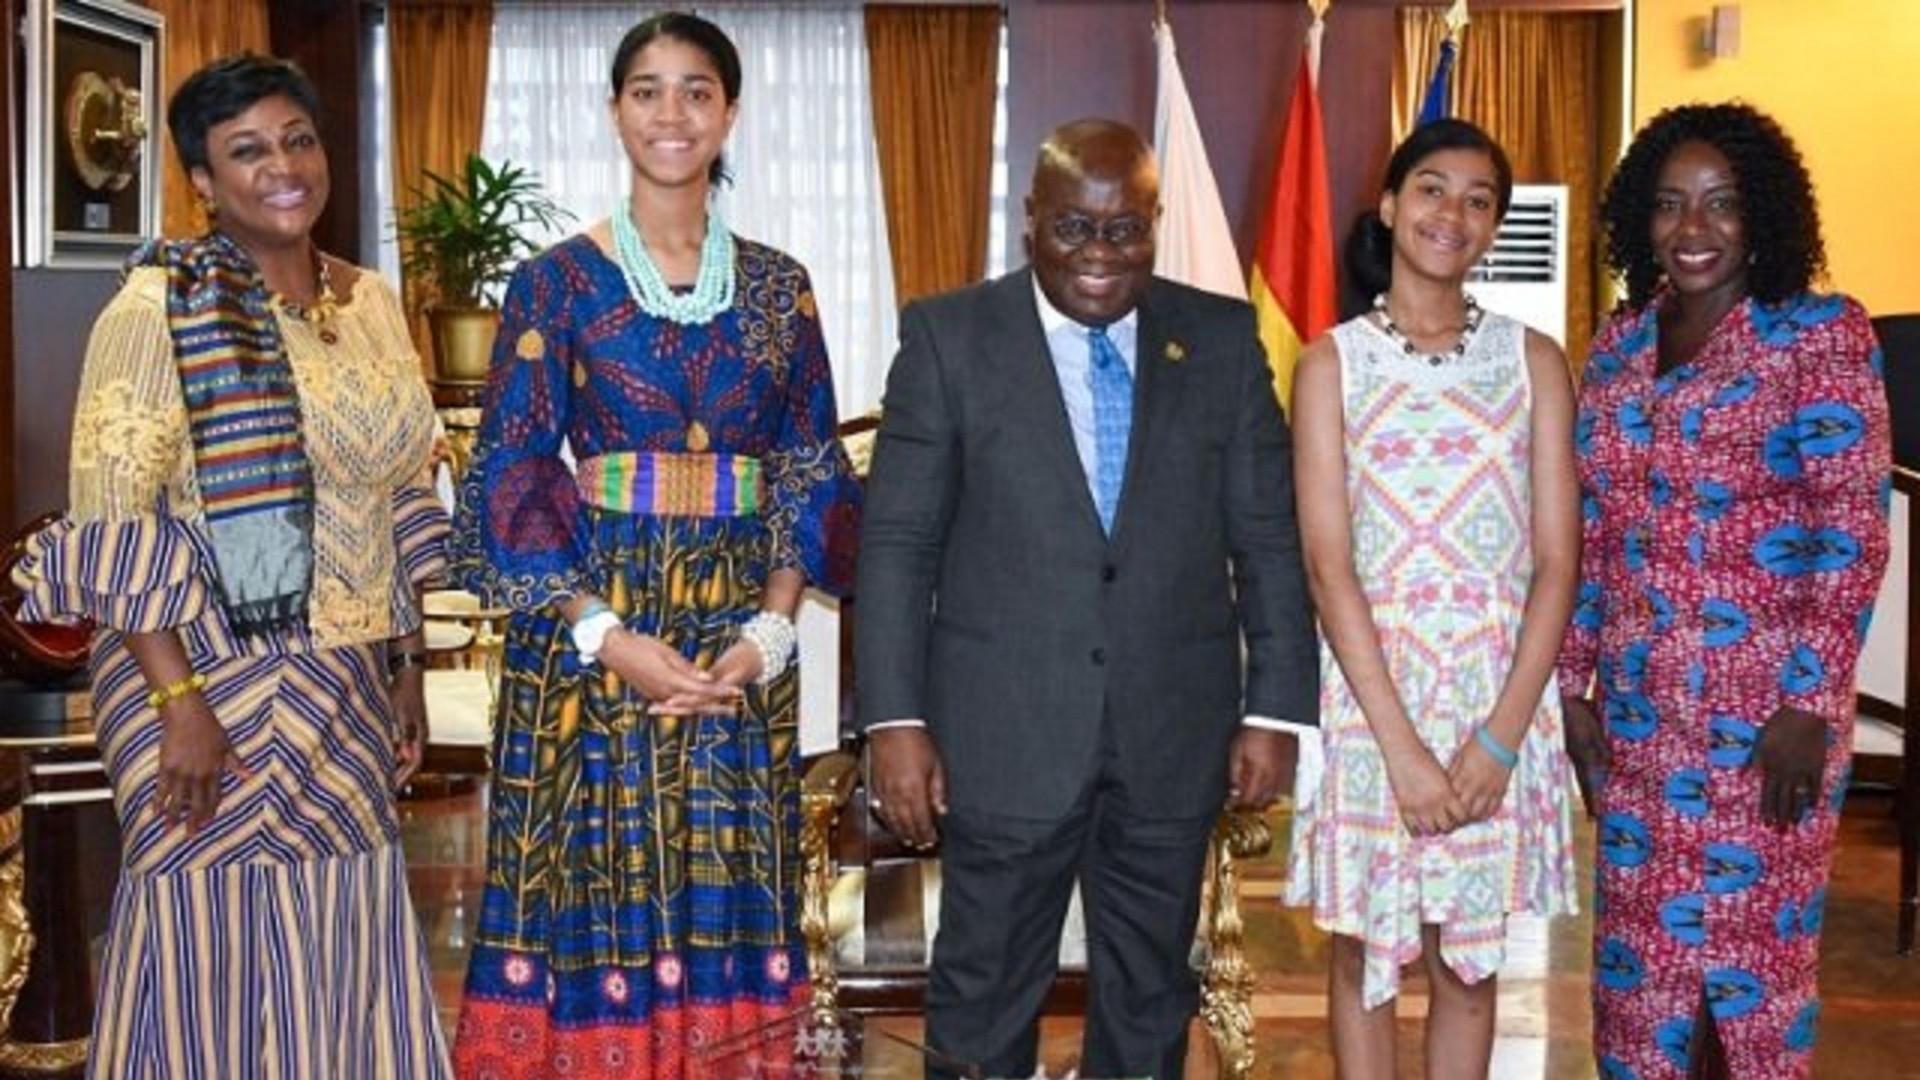 President Akufo-Addo of Ghana